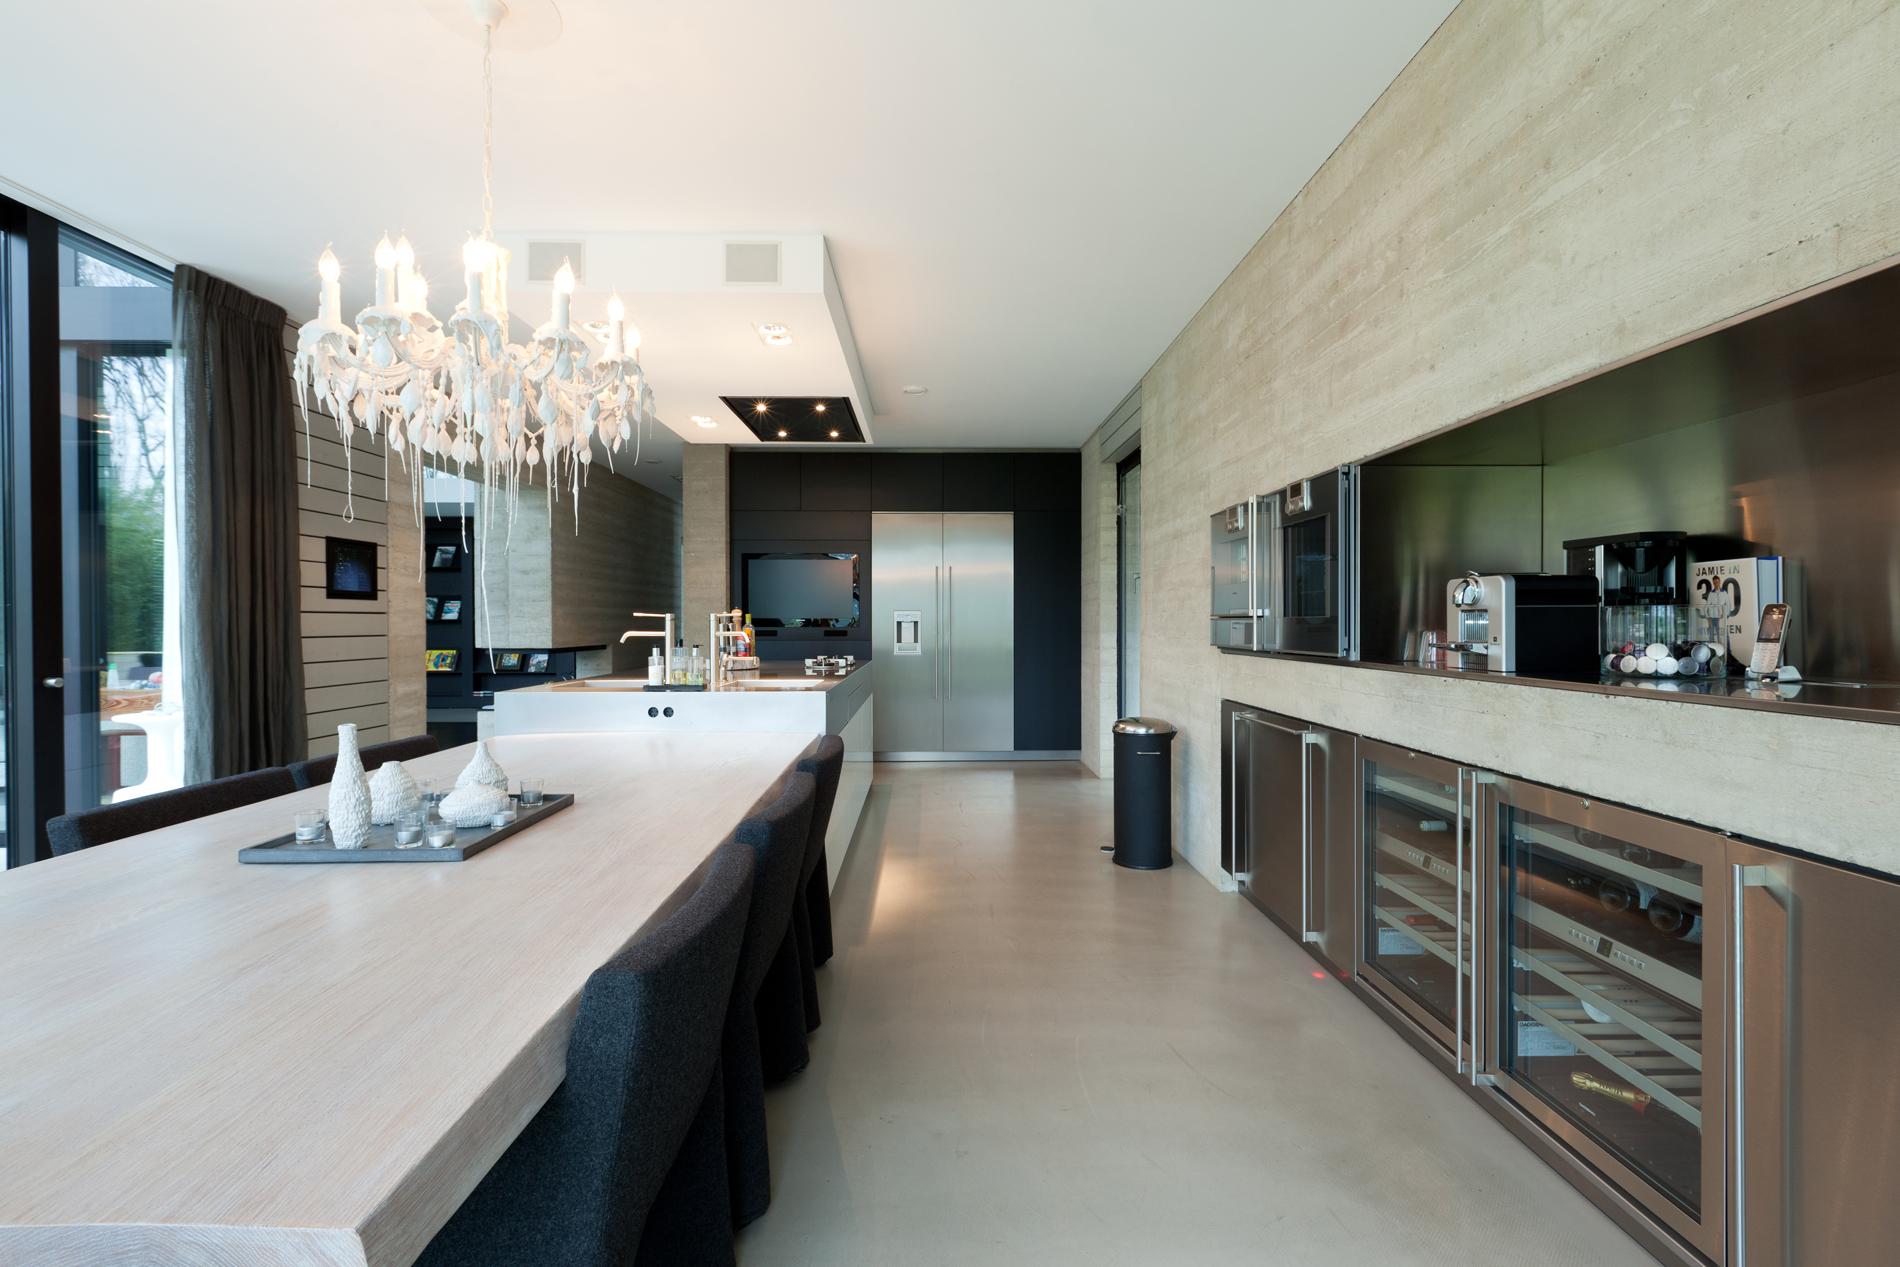 Exclusieve keukens nieuwe keuken kopen? aswa keukens